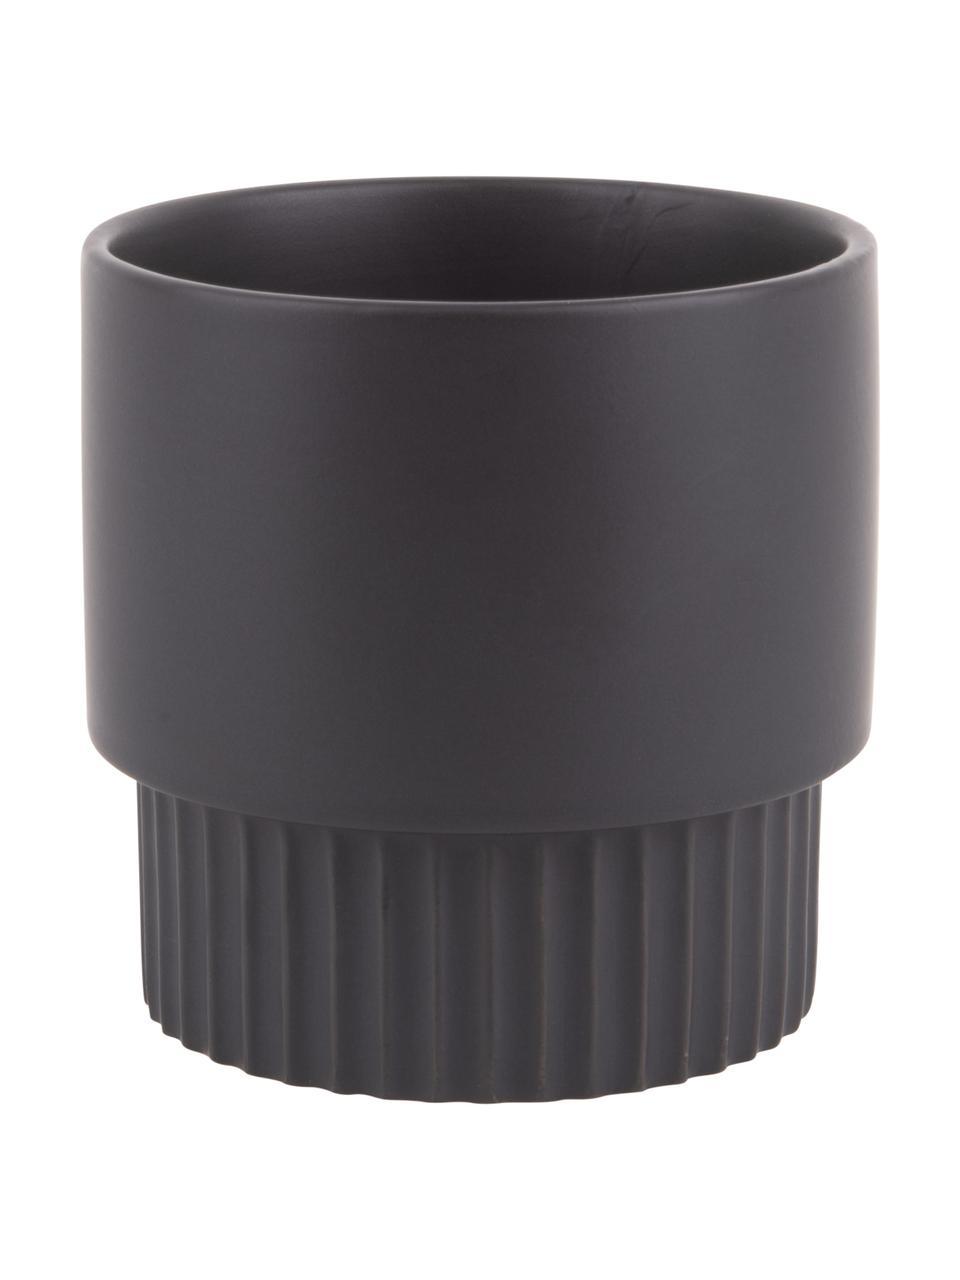 Übertopf Ribbed aus Keramik, Keramik, Schwarz, Ø 13 x H 14 cm